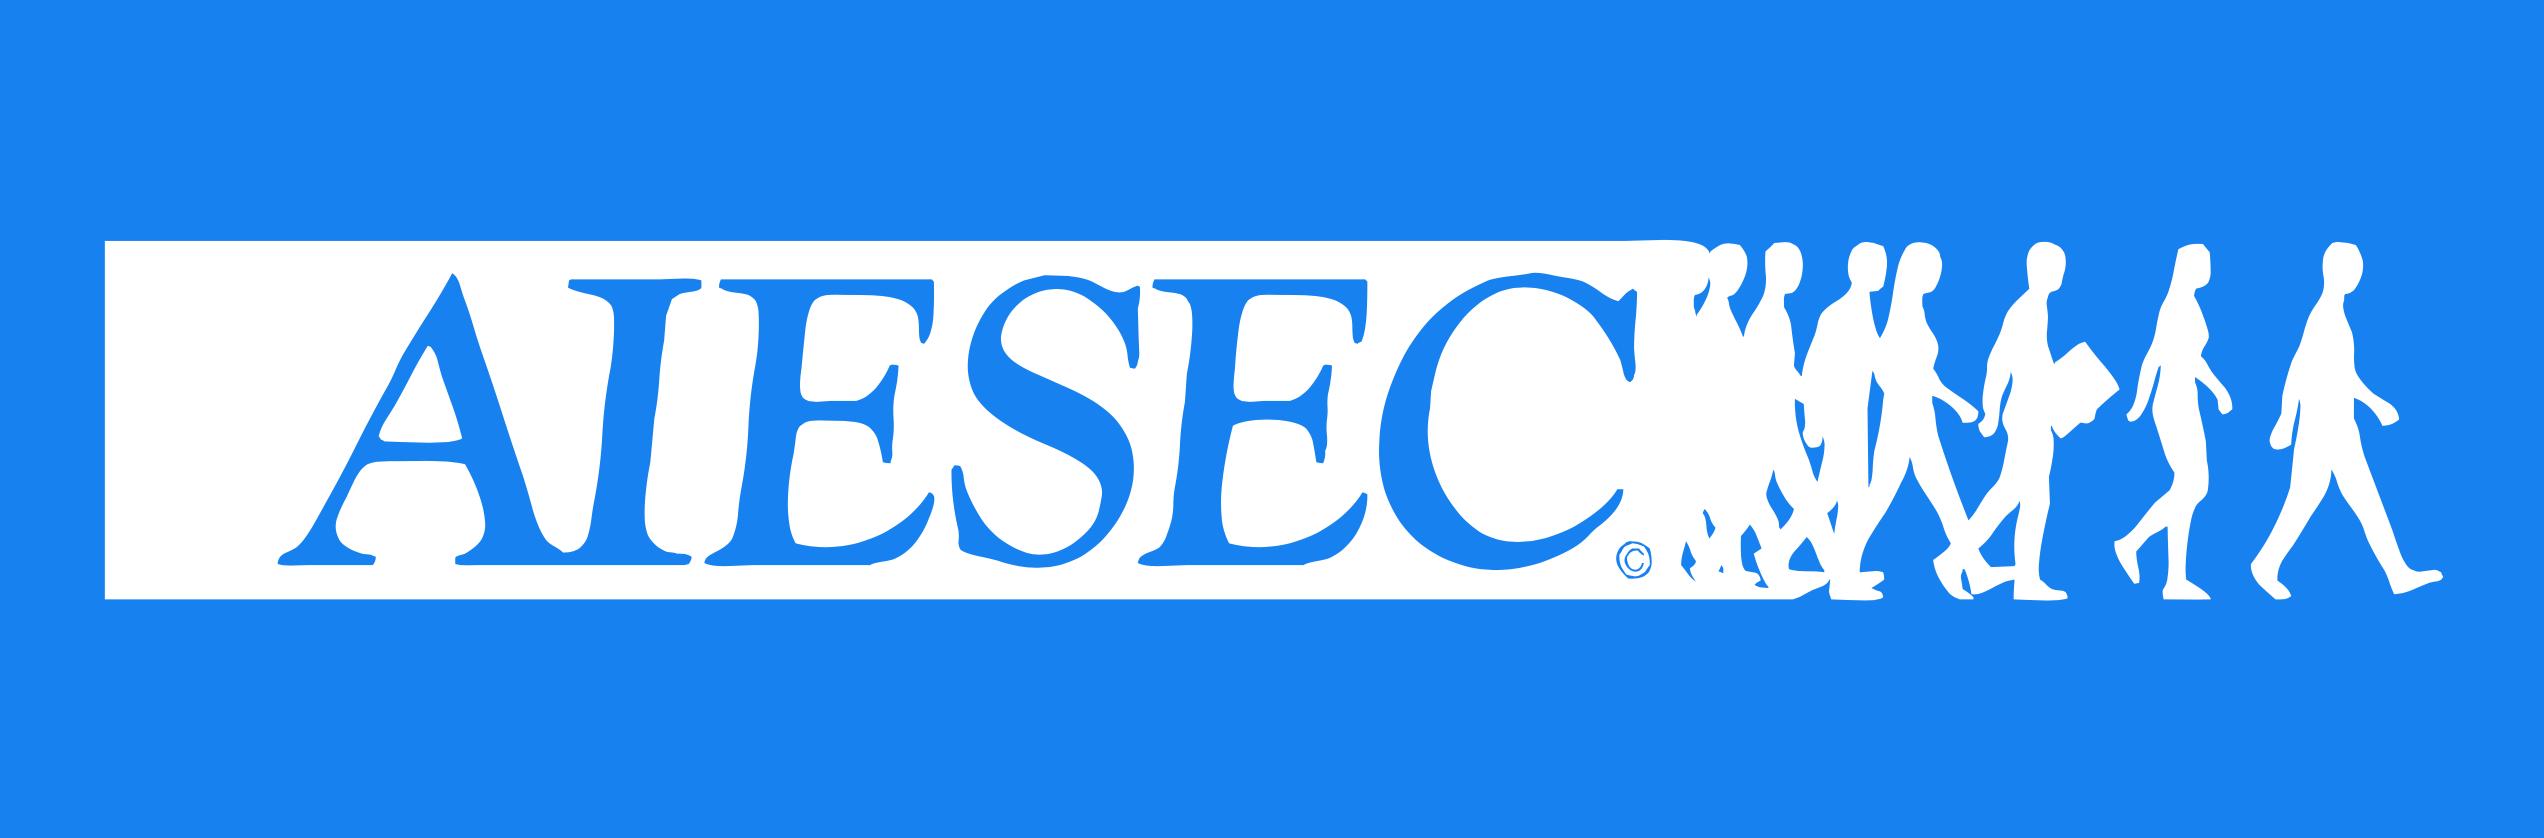 AIESEC Lokalkomitee Münster